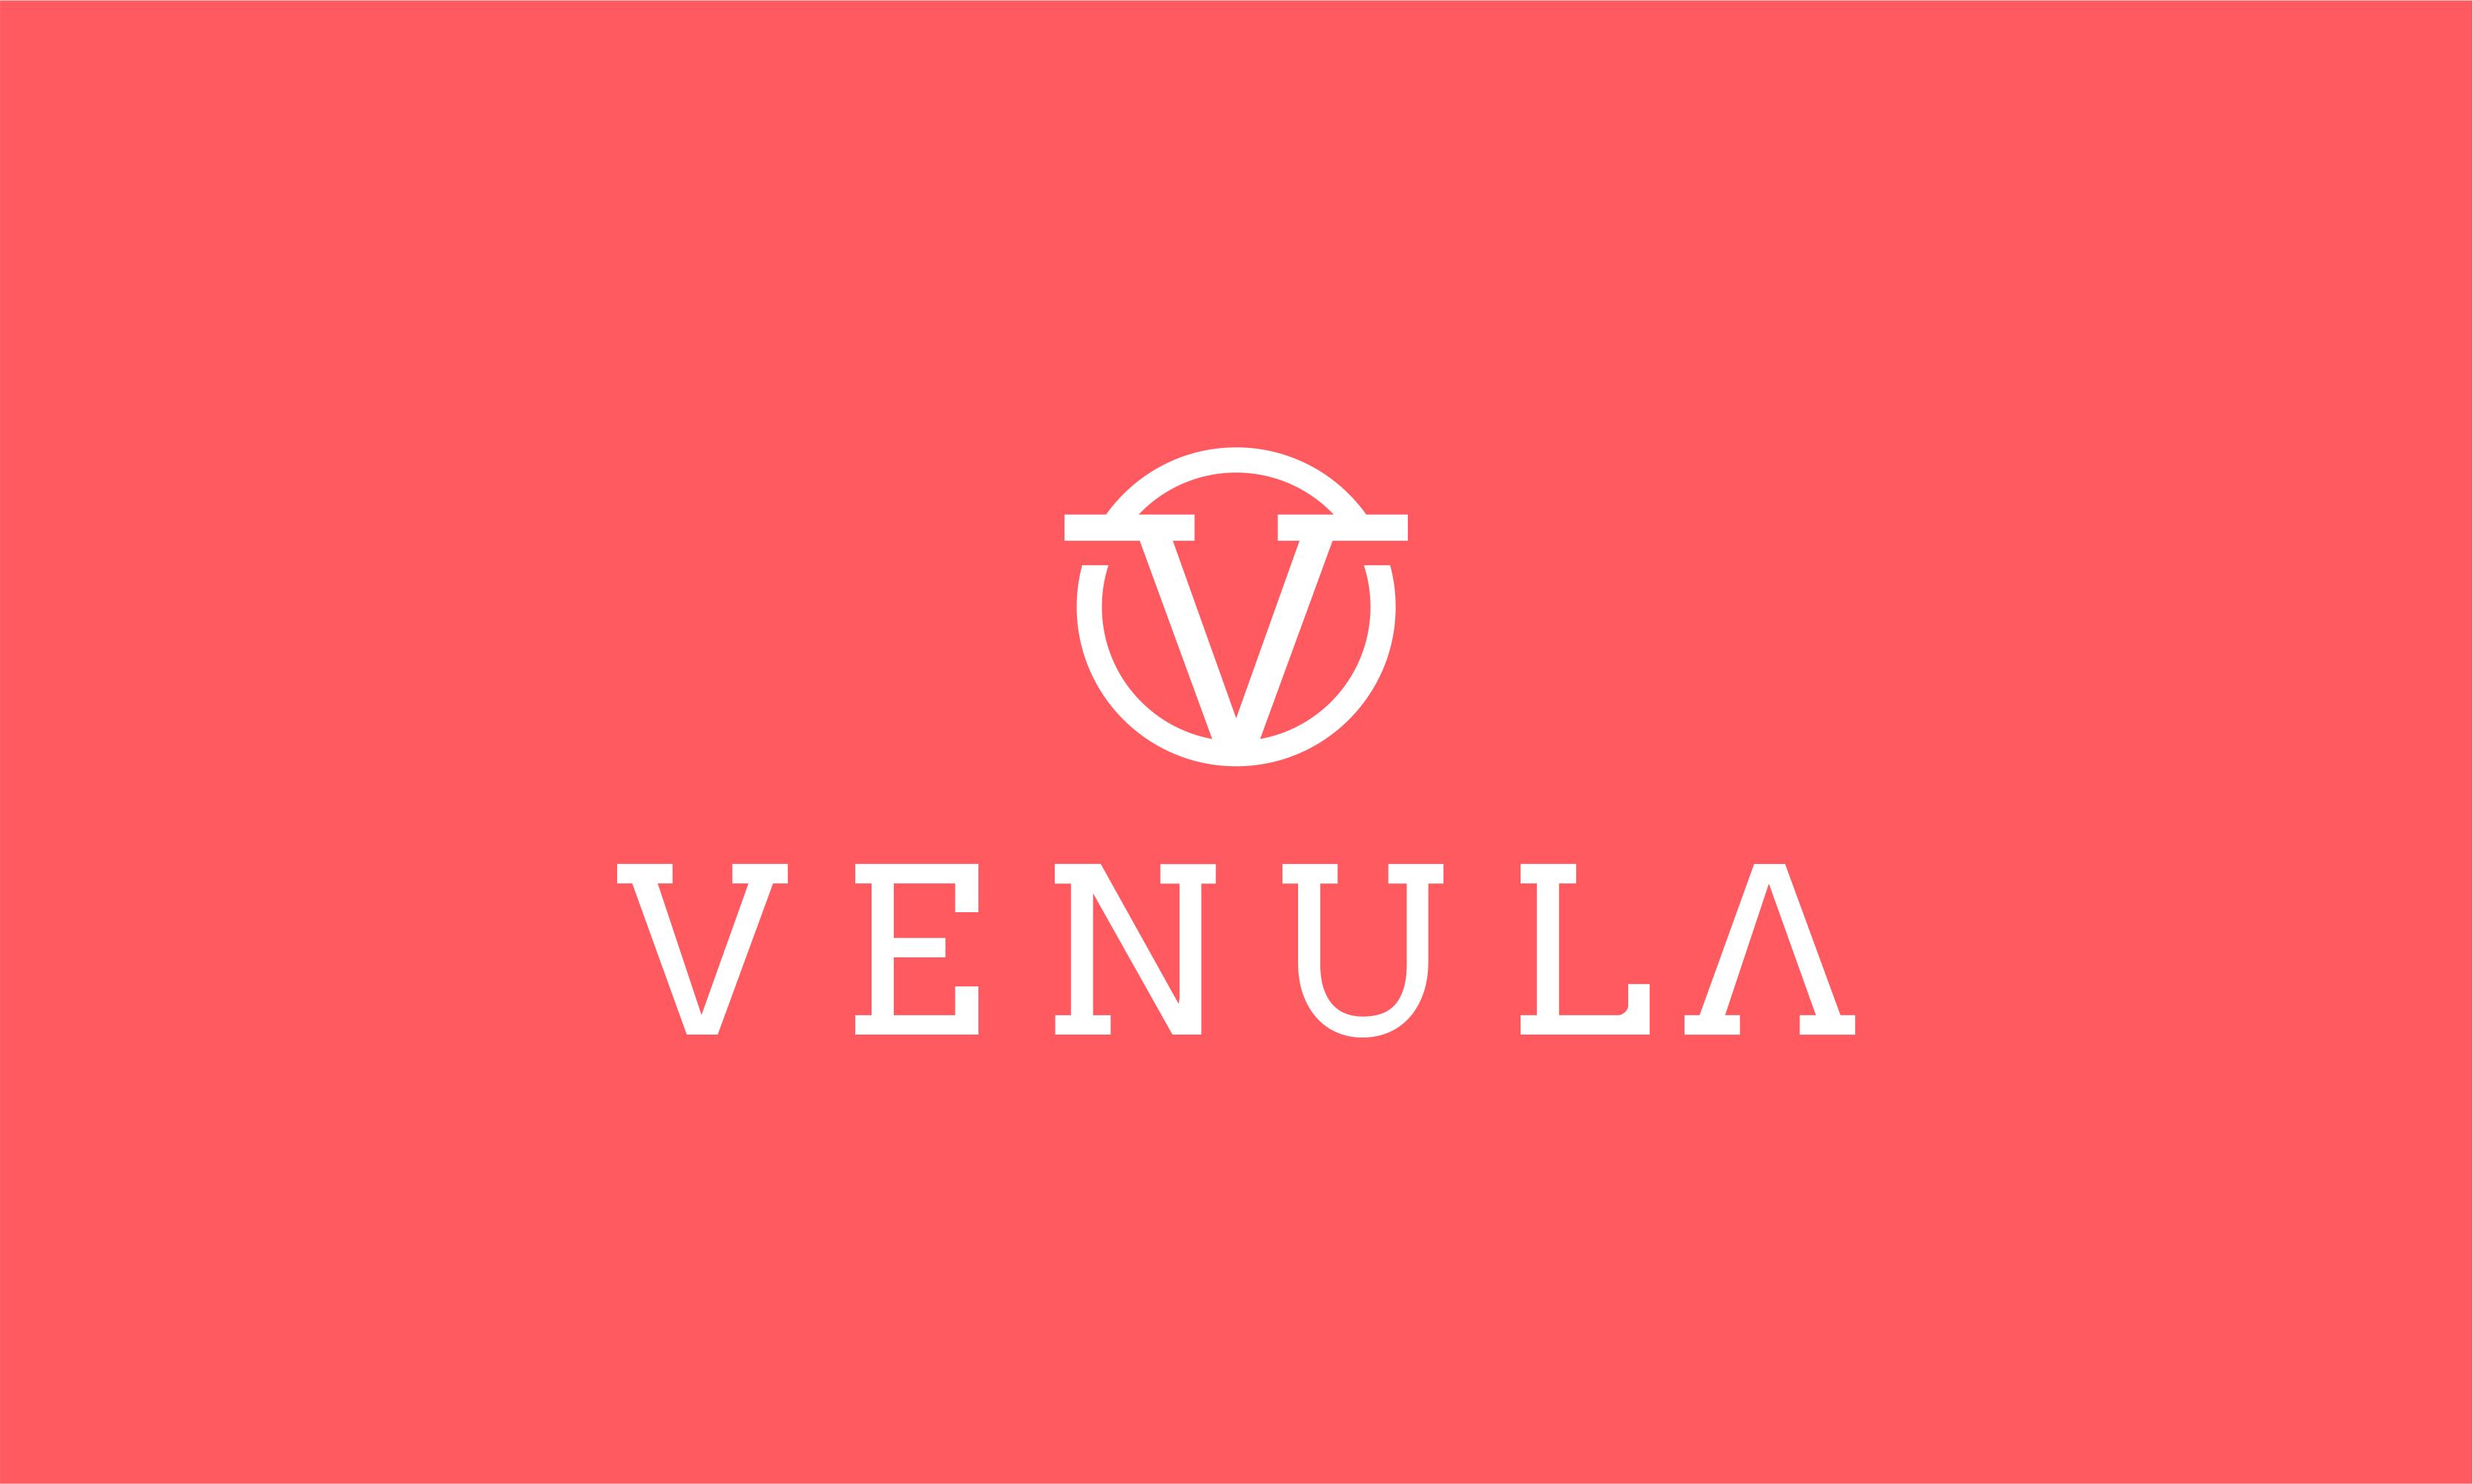 Venula